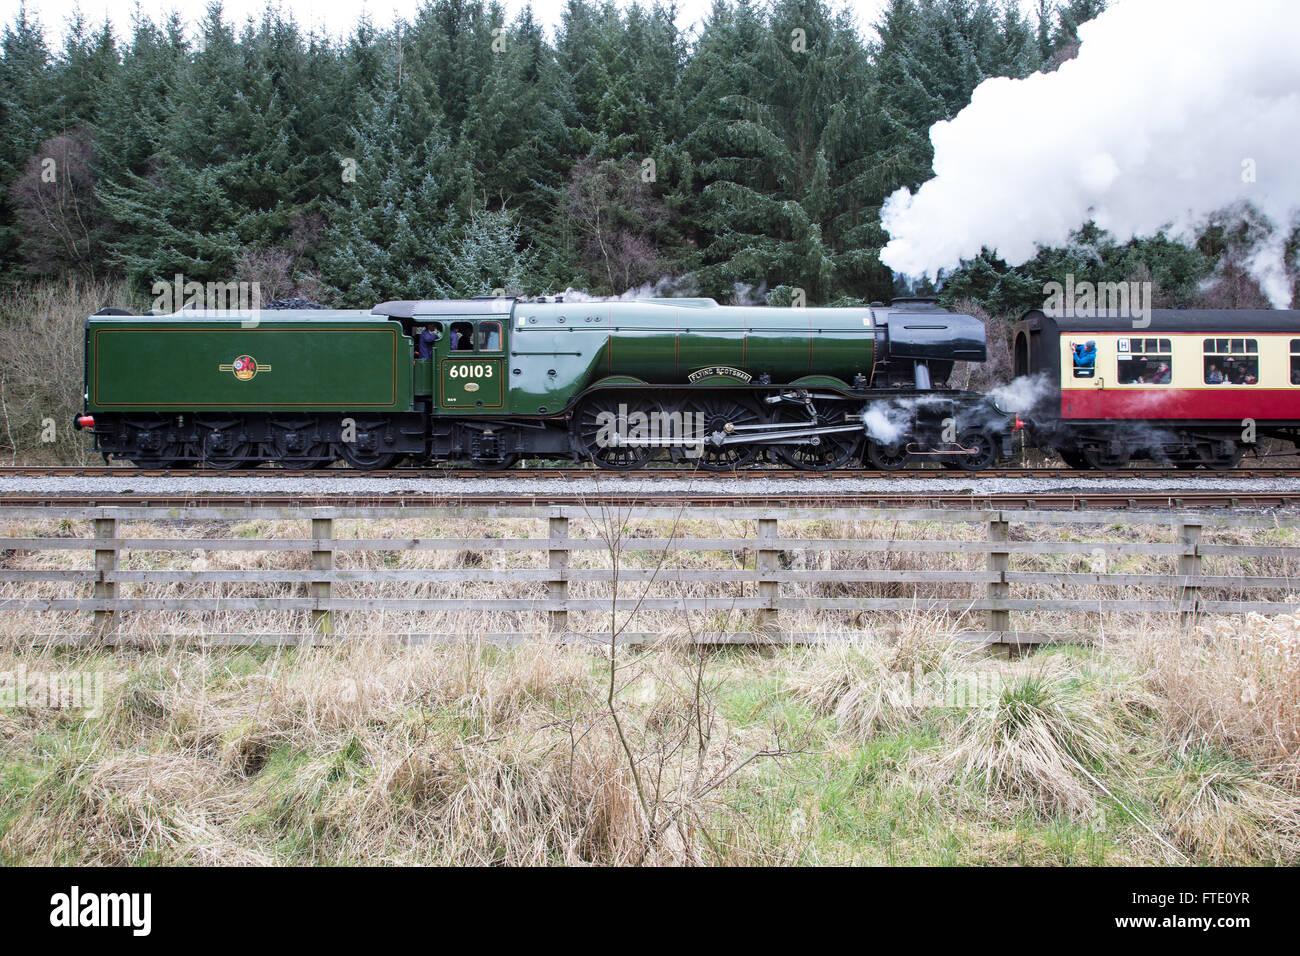 Flying Scotsman steam locomotive following its complete refurbishment in 2016 near Levisham station - Stock Image